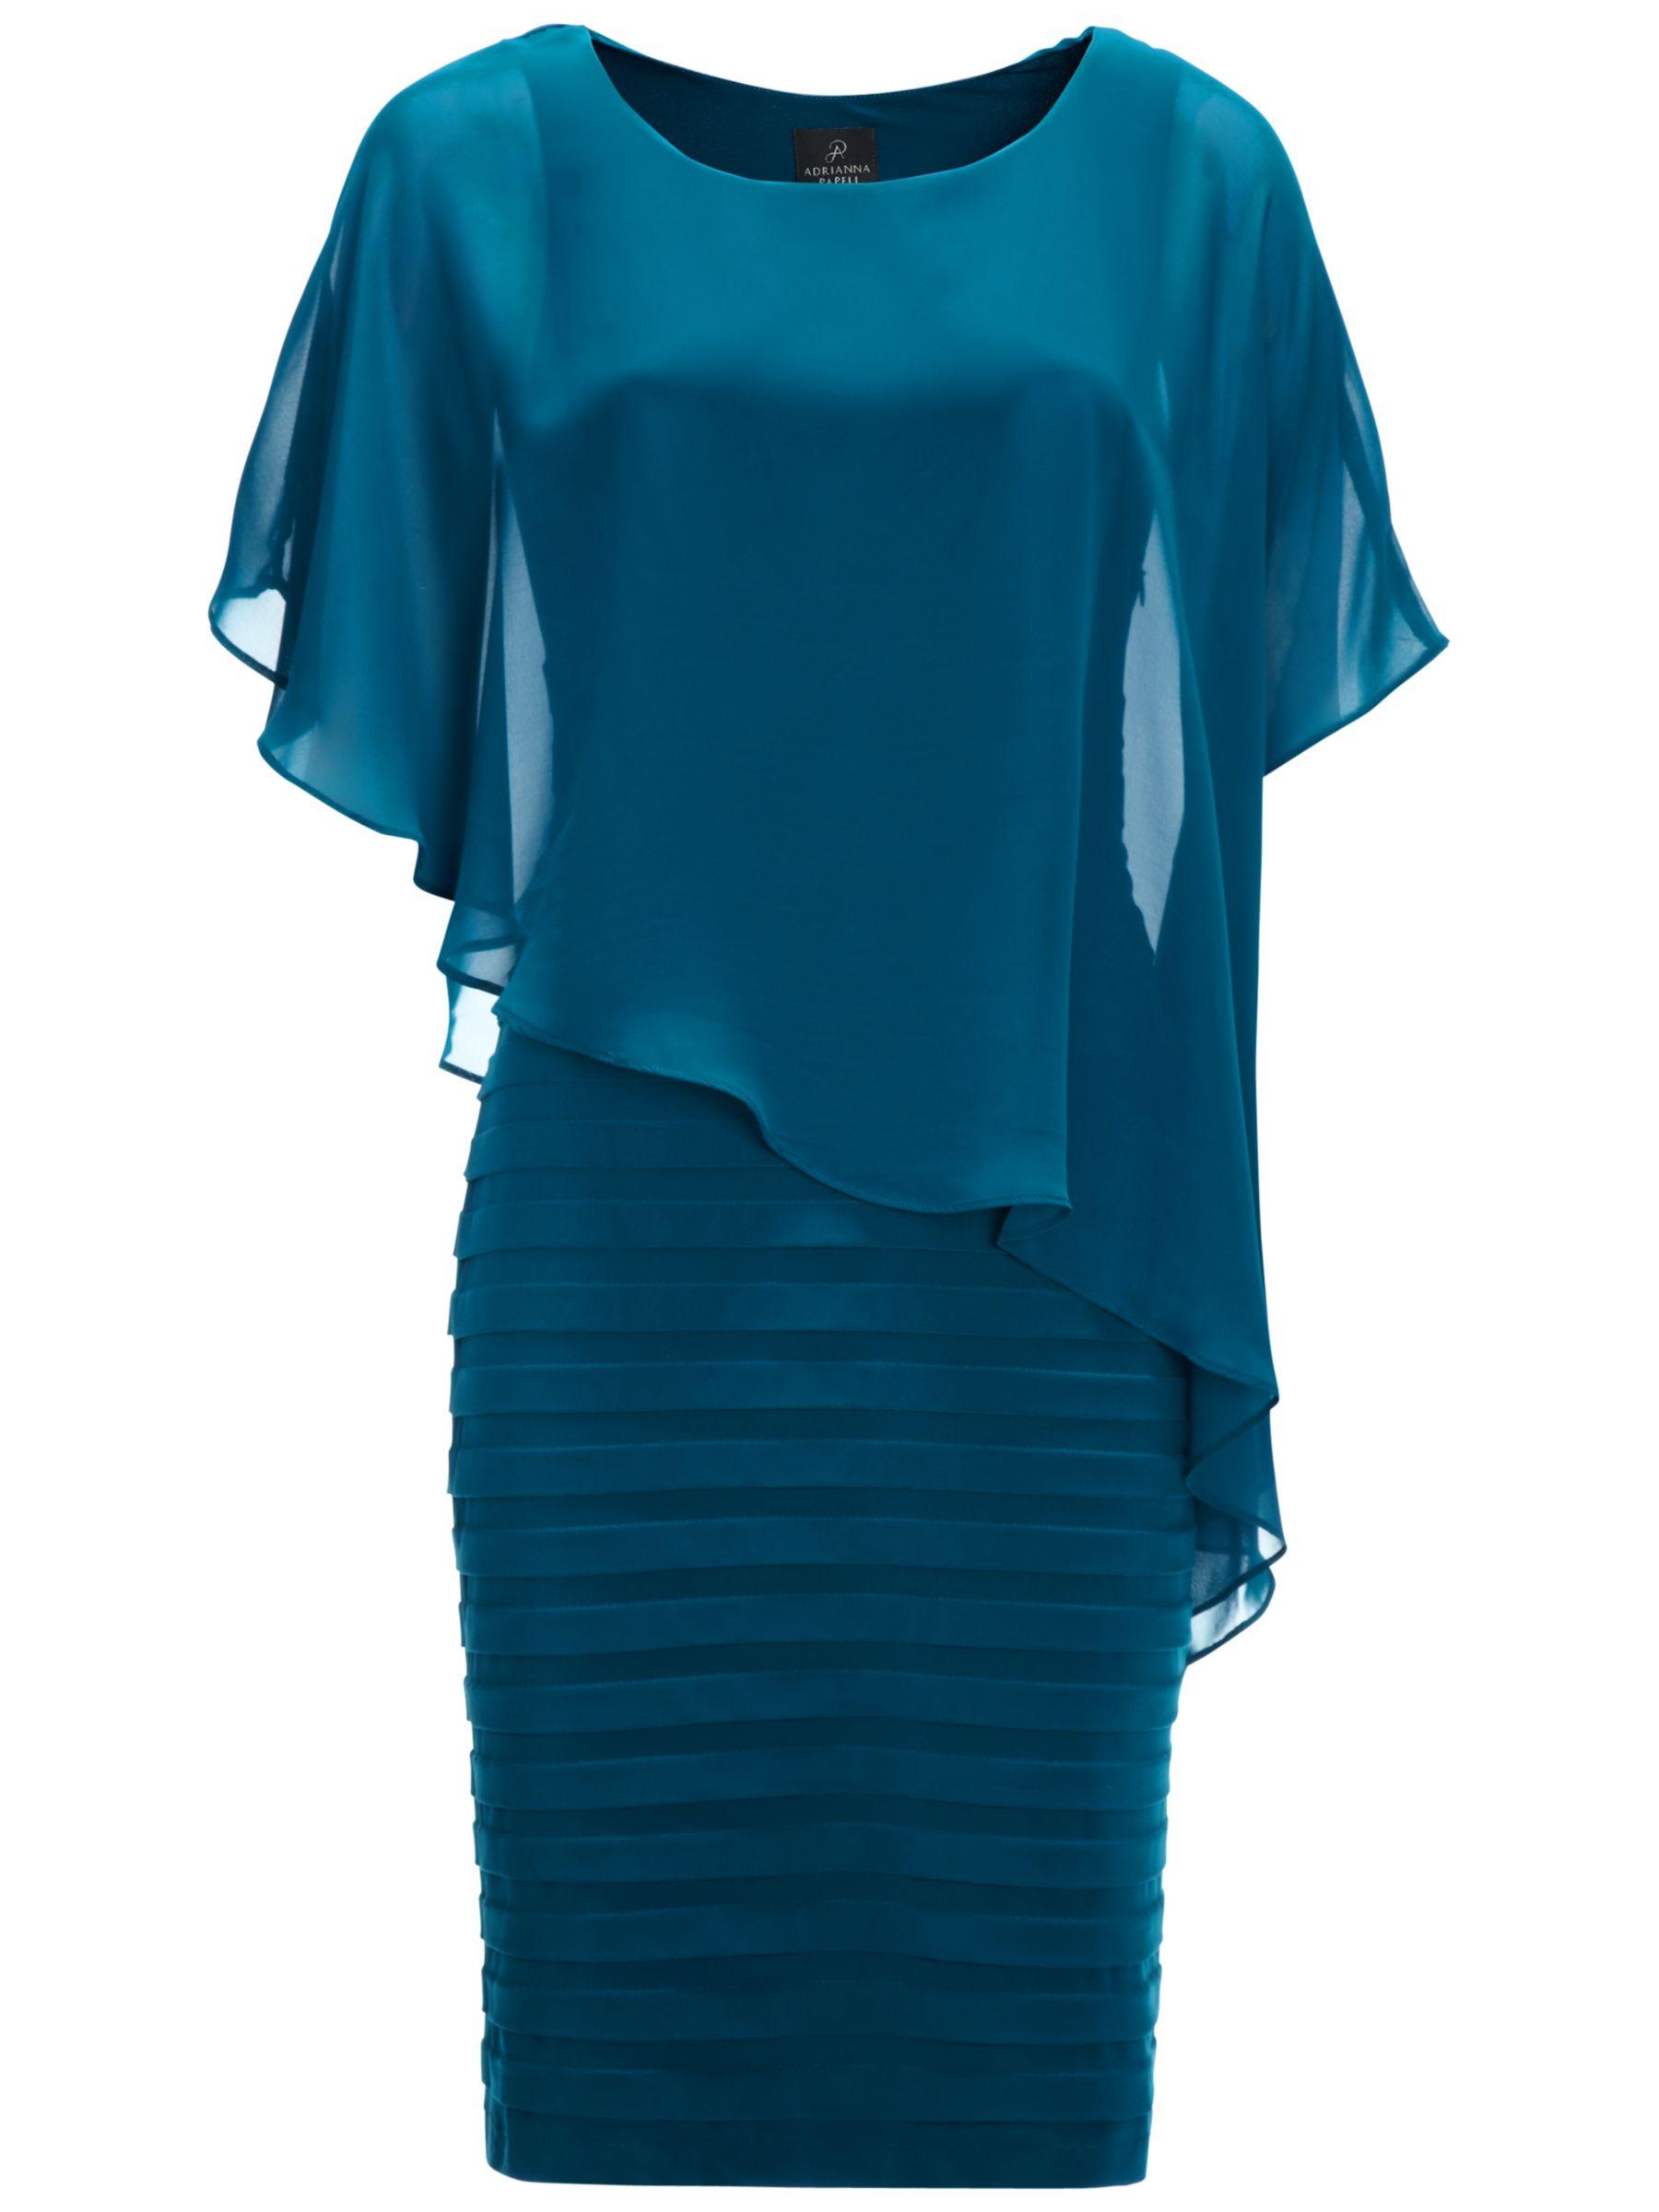 Adrianna Papell Chiffon Drape Dress, Deep Turquoise